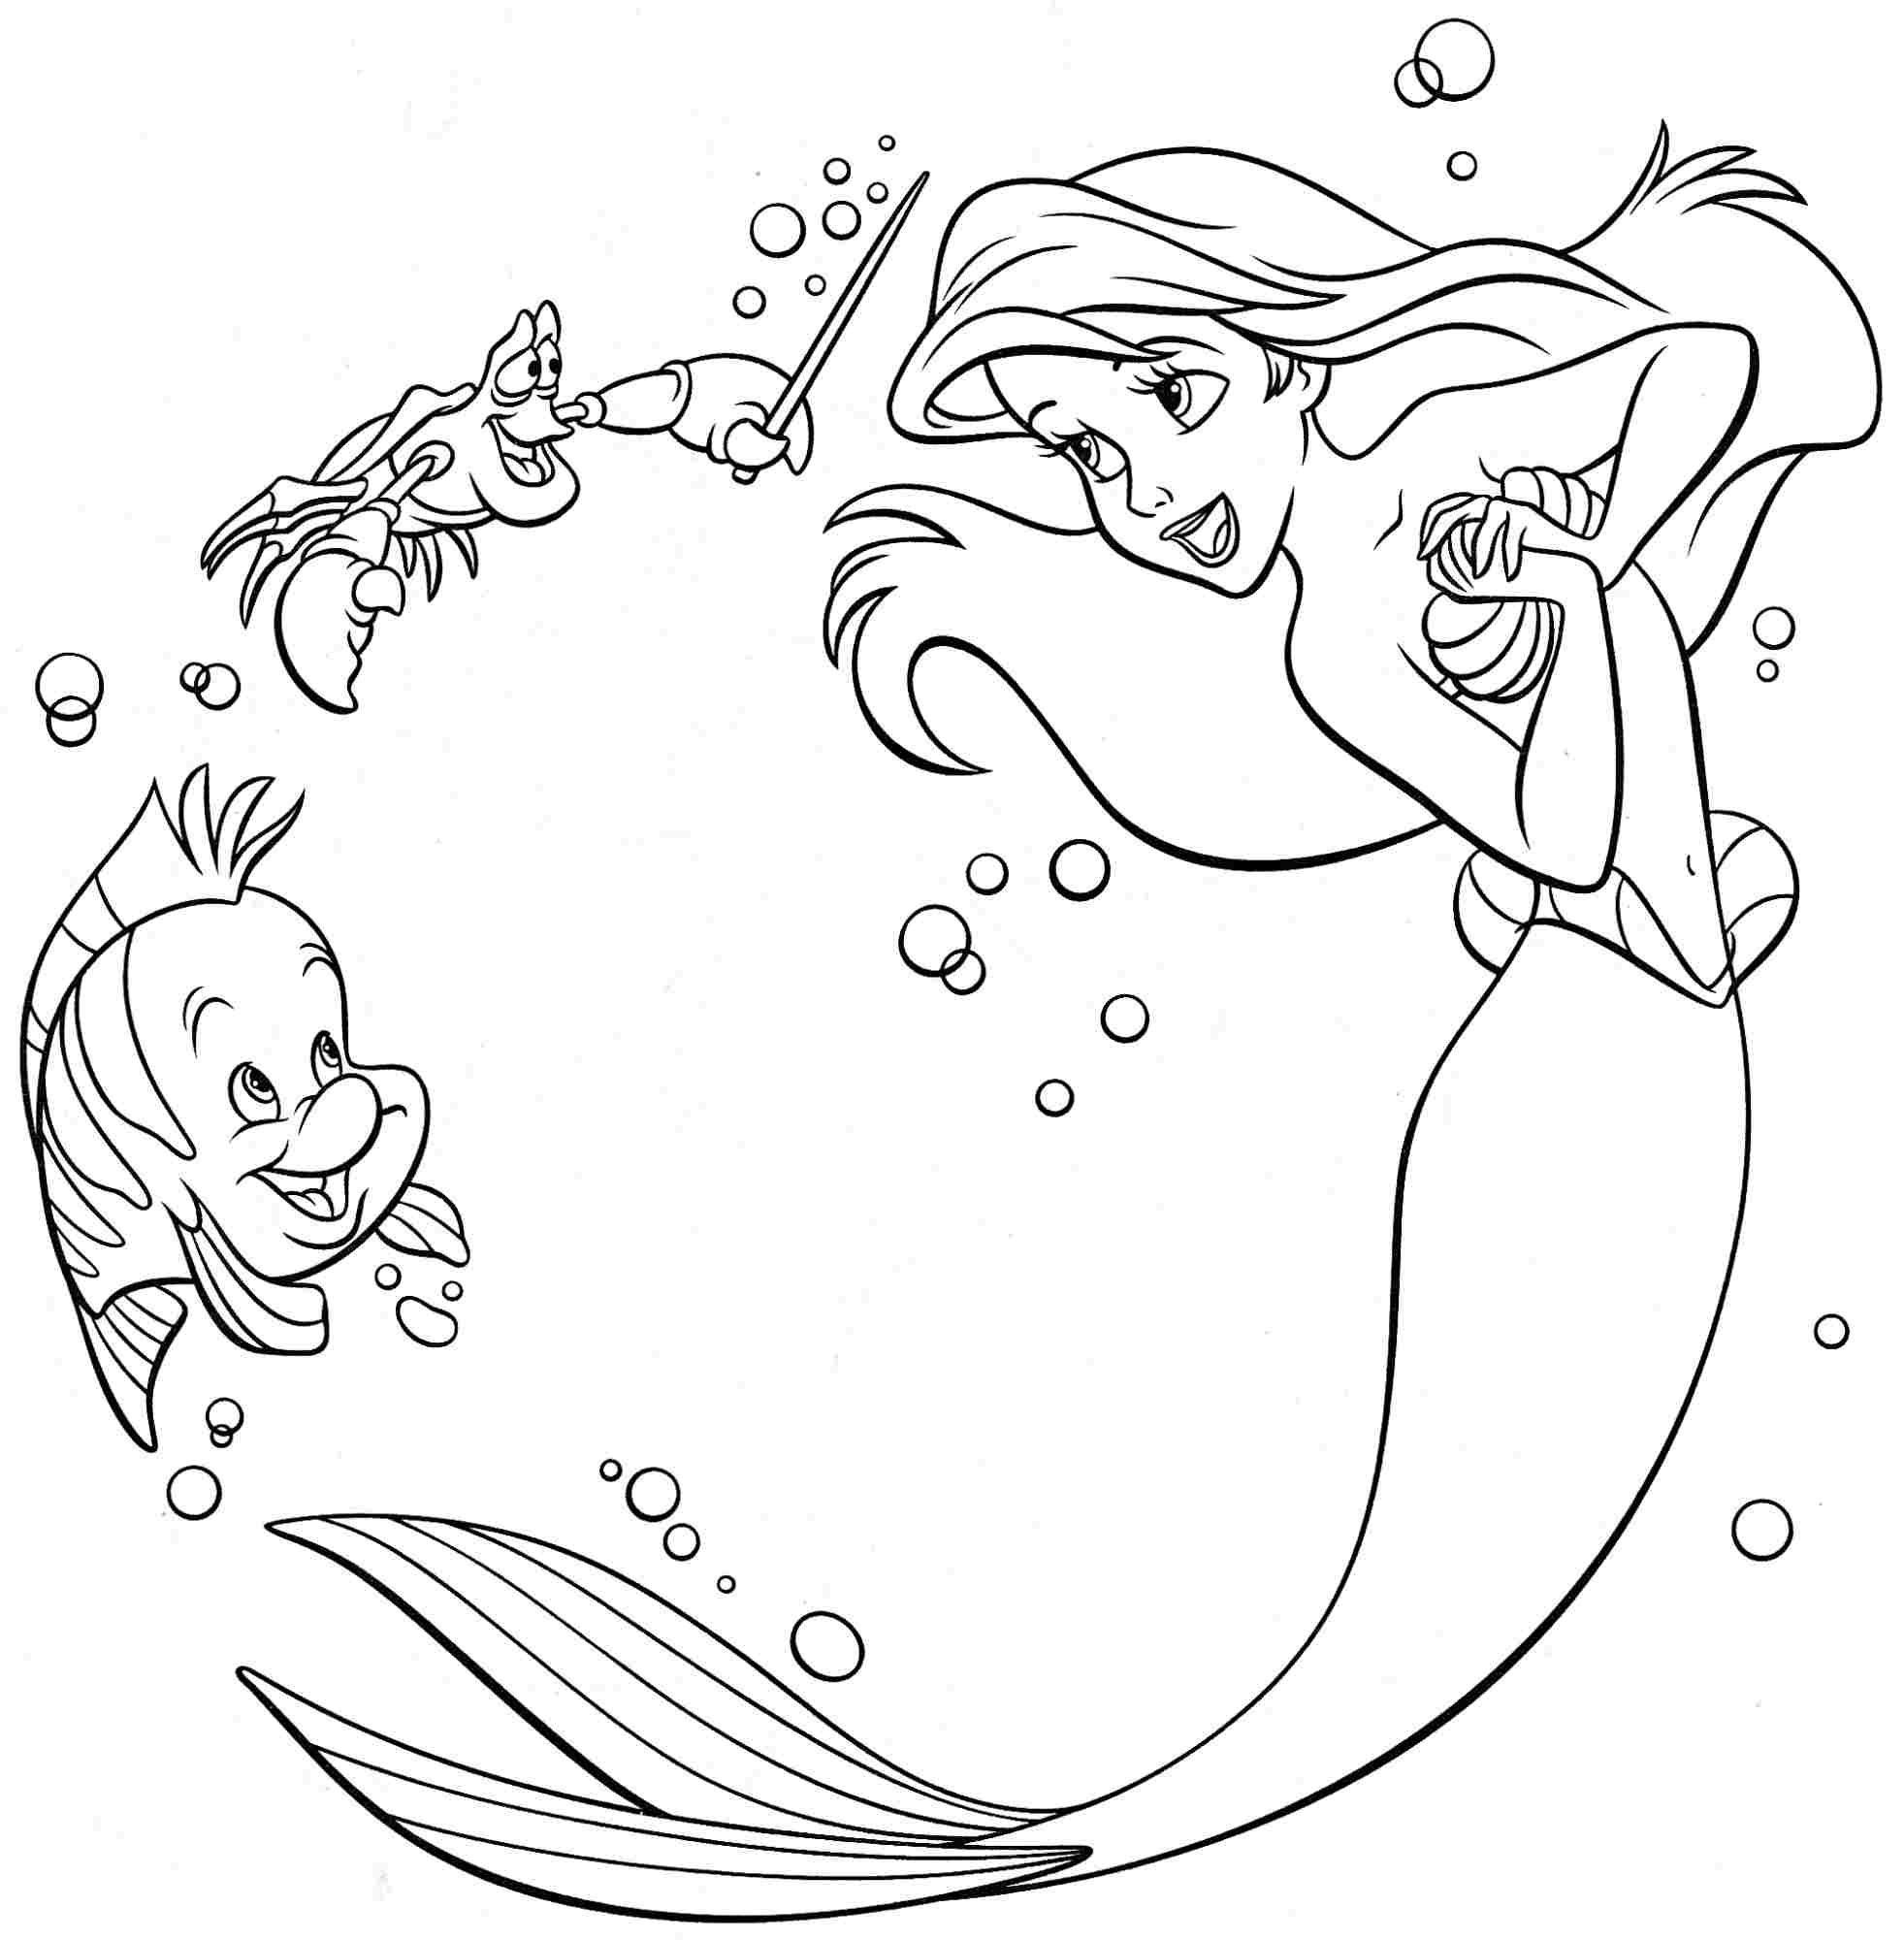 Disney Princess Mermaid Coloring Pages 249020 Disney Princess Ariel Coloring Pages Mermaid Coloring Book Ariel Coloring Pages Mermaid Coloring Pages